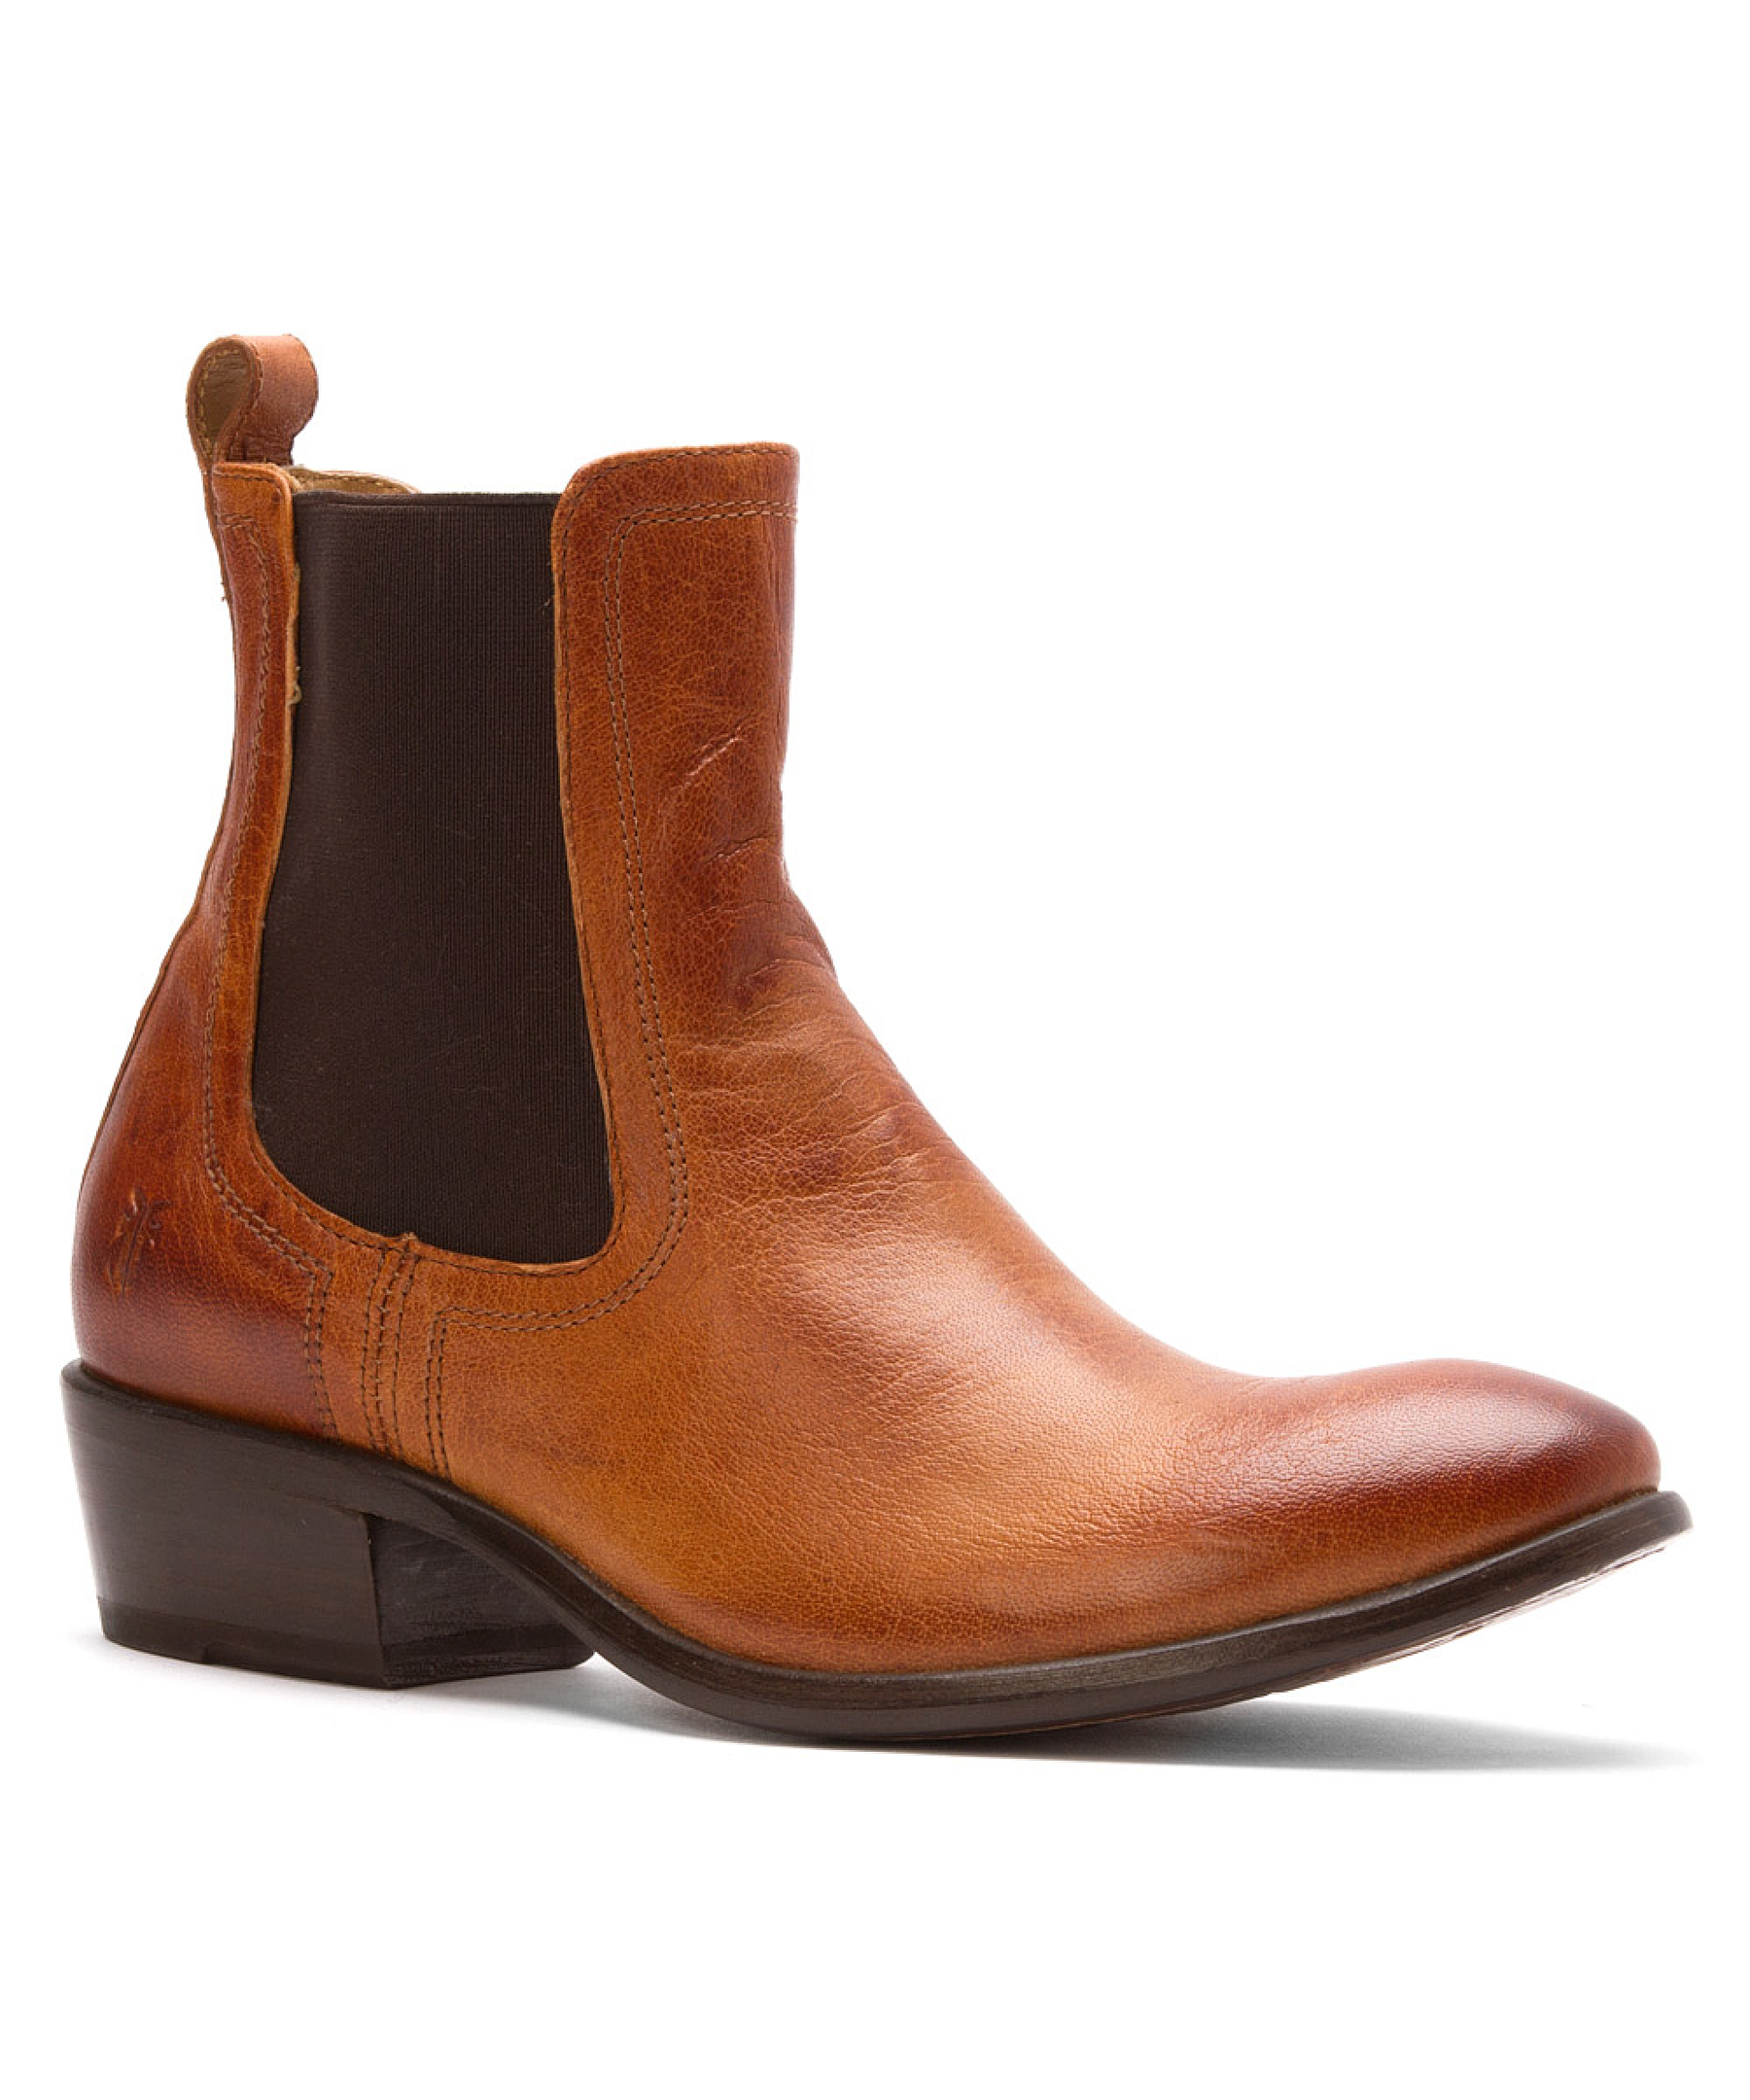 Creative Frye Womens Phillip Chelsea Boots  Iifootwear